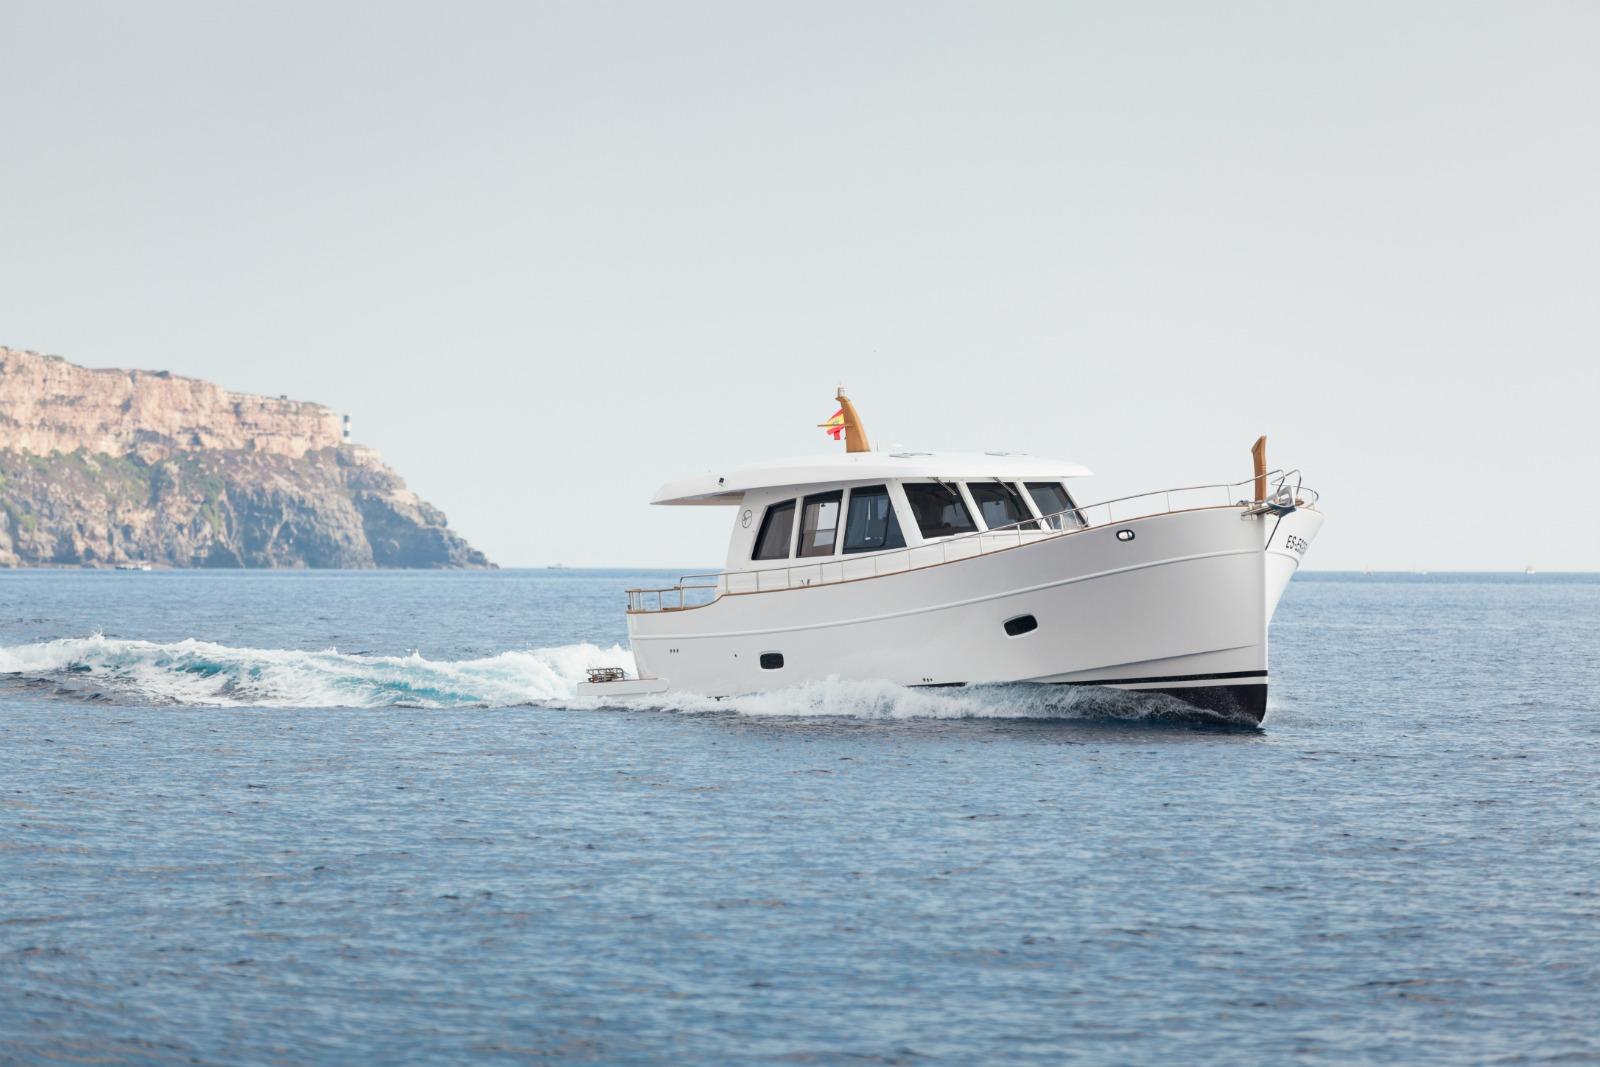 Islander 54 yacht for sale